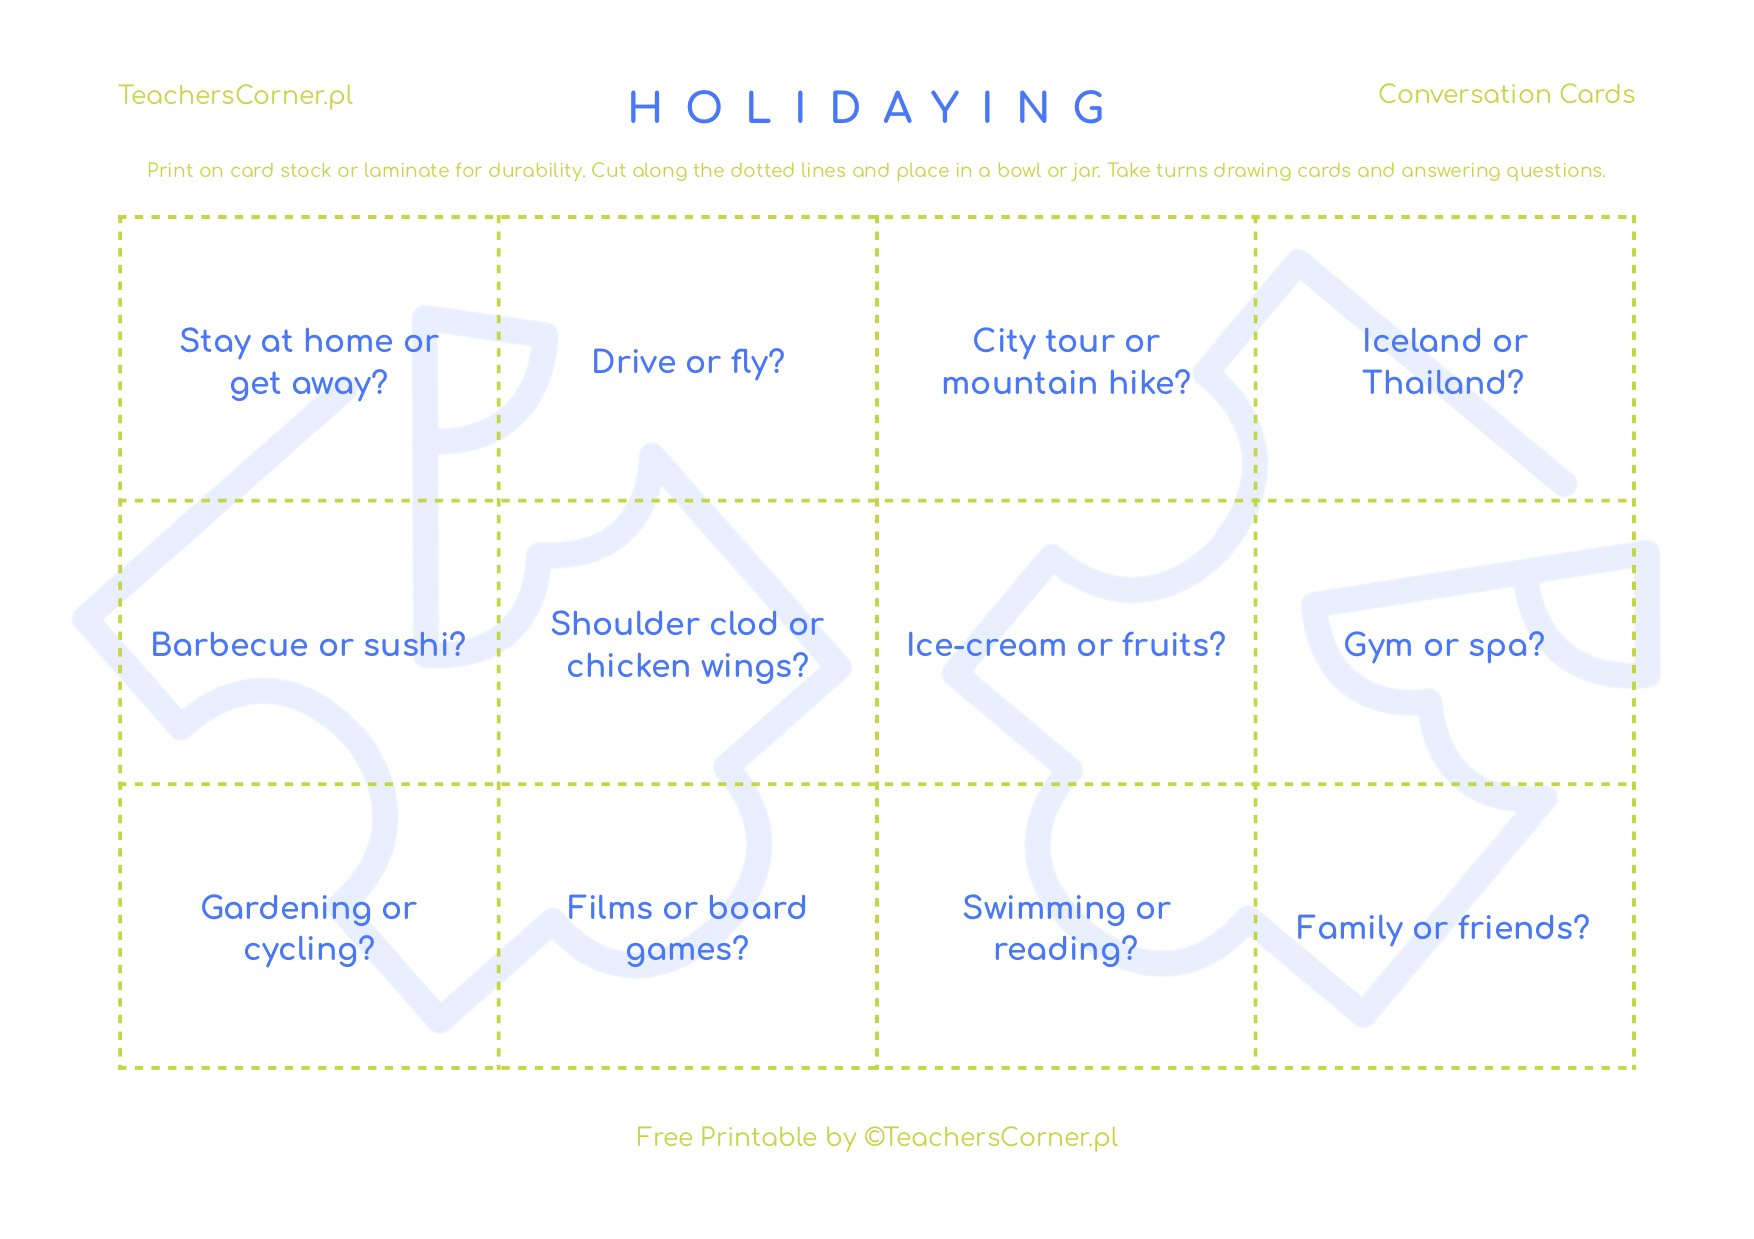 karty konwersacyjjne Holidaying